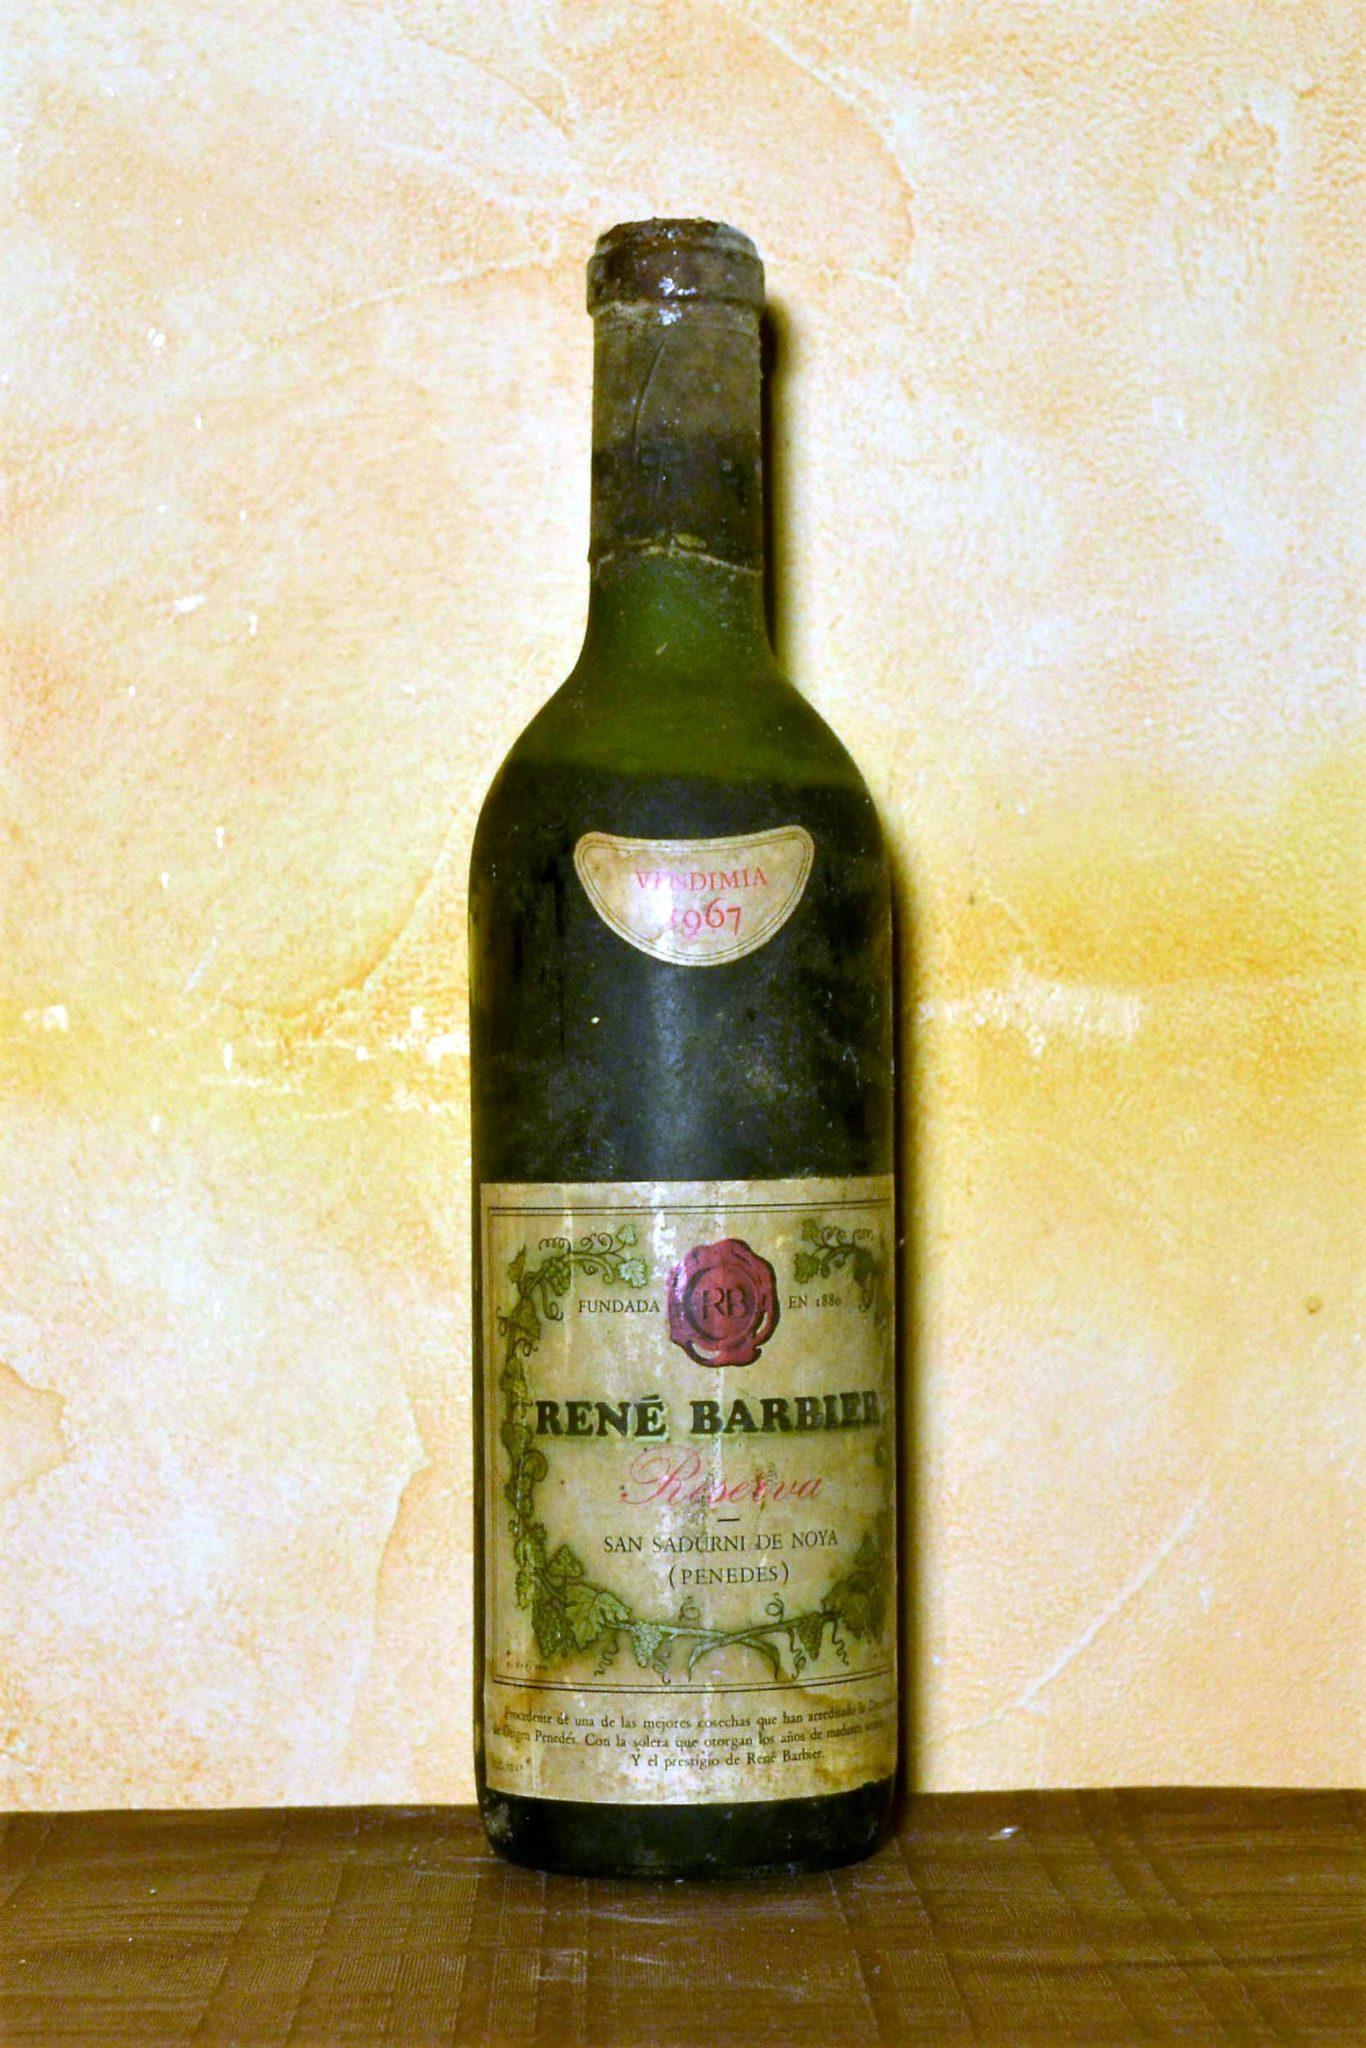 Rene Barbier Reserve 1967